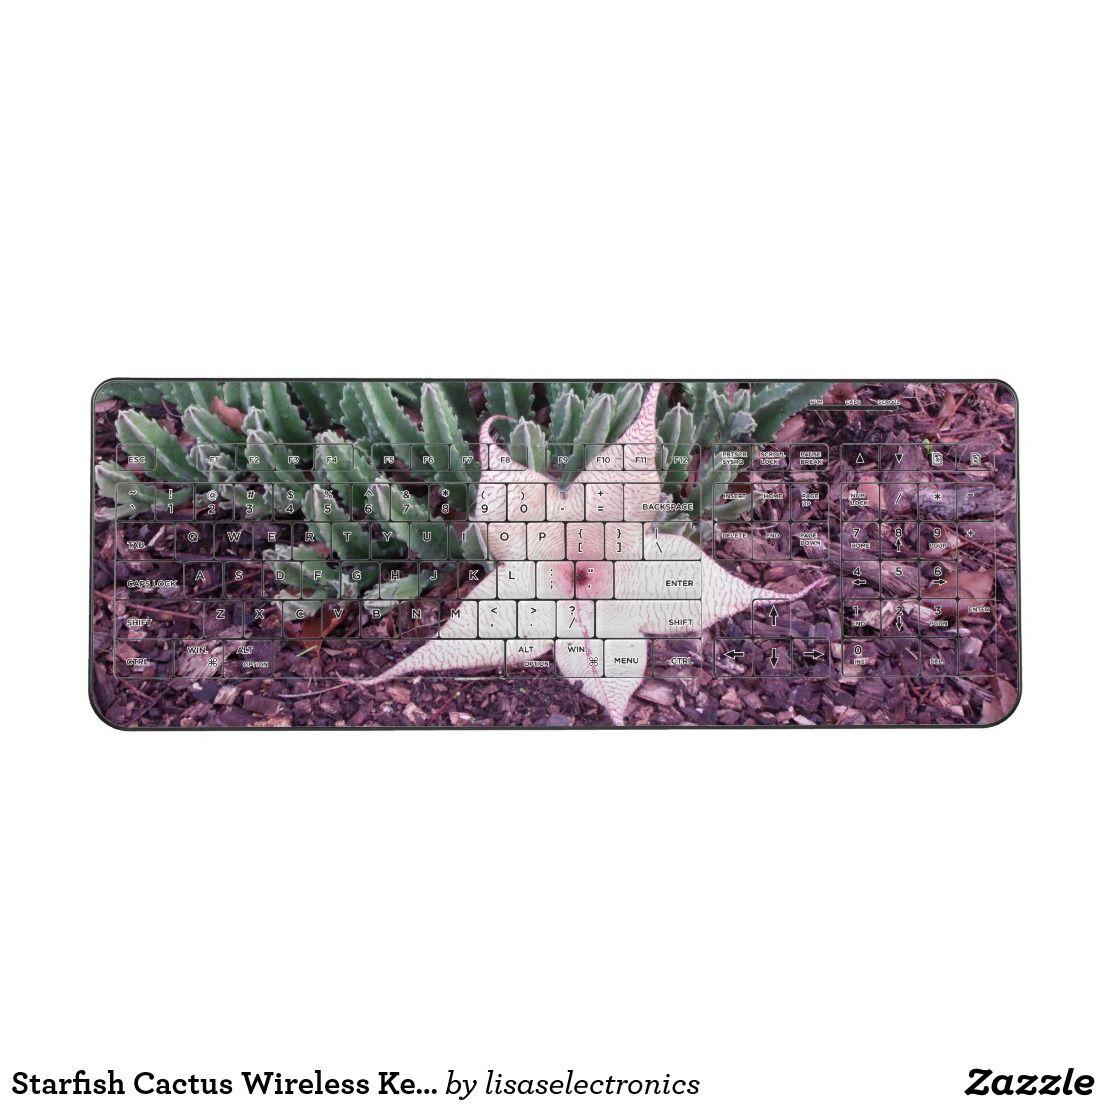 Starfish Cactus Wireless Keyboard